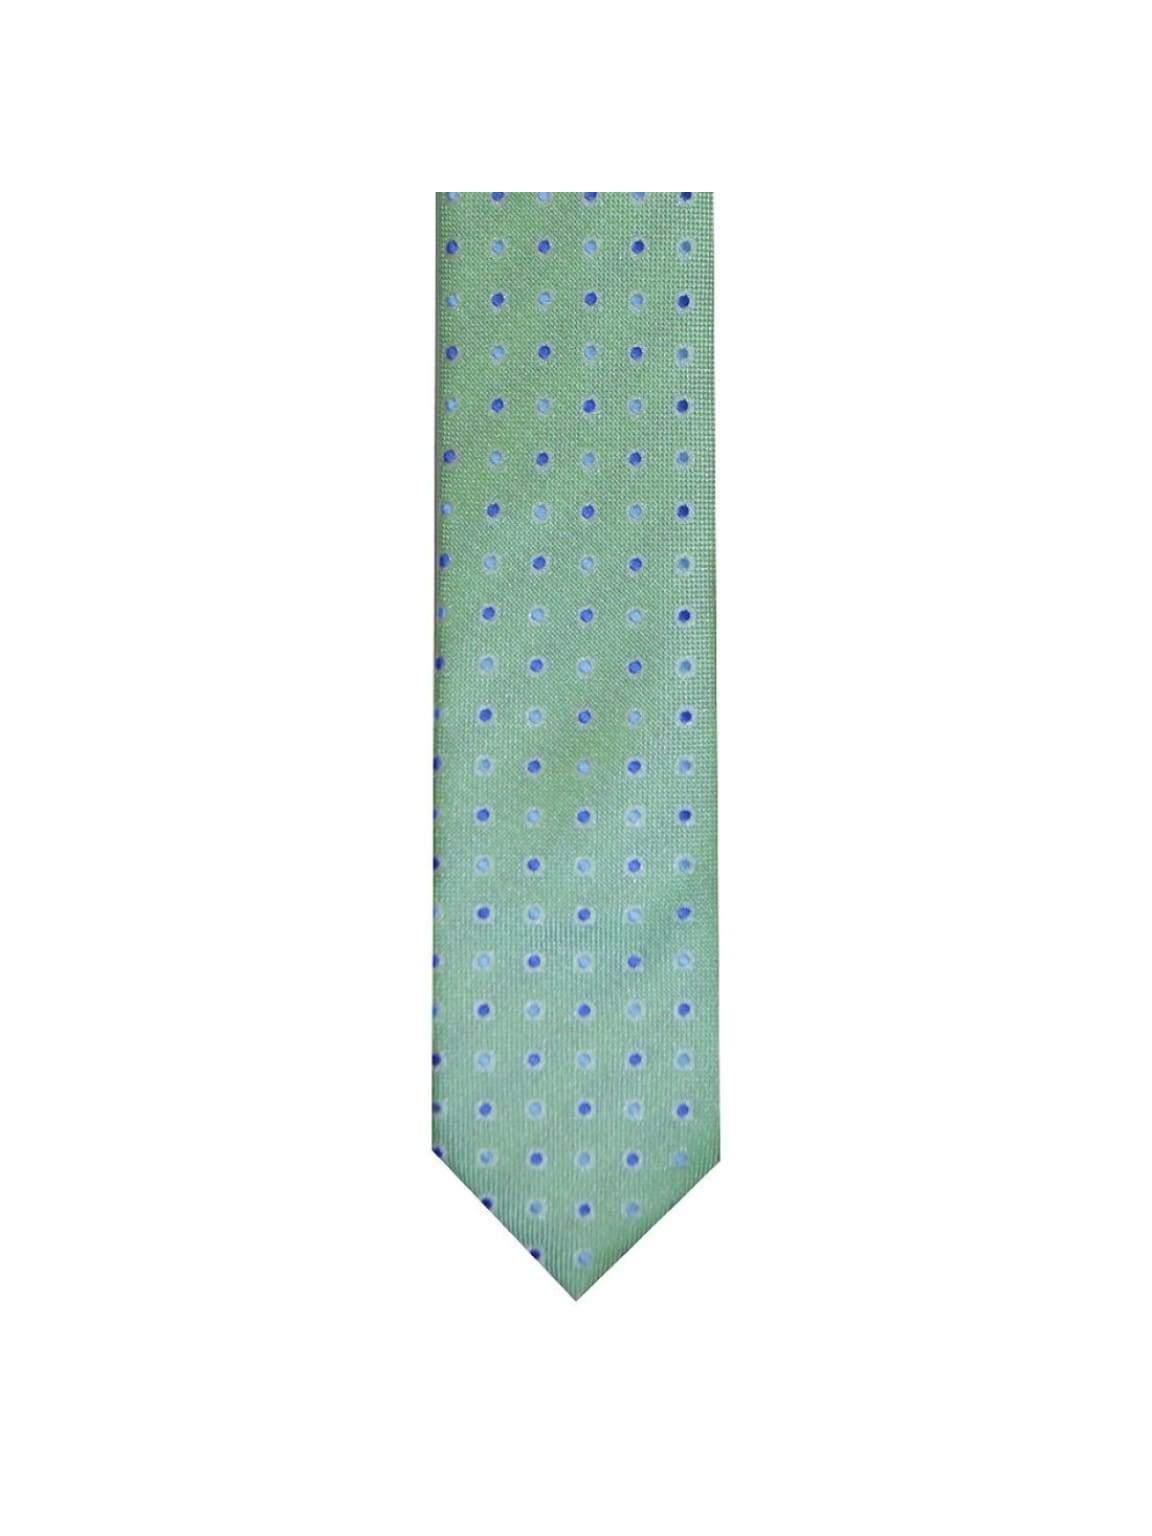 LA Smith Green Skinny Polka Dot Tie - Accessories